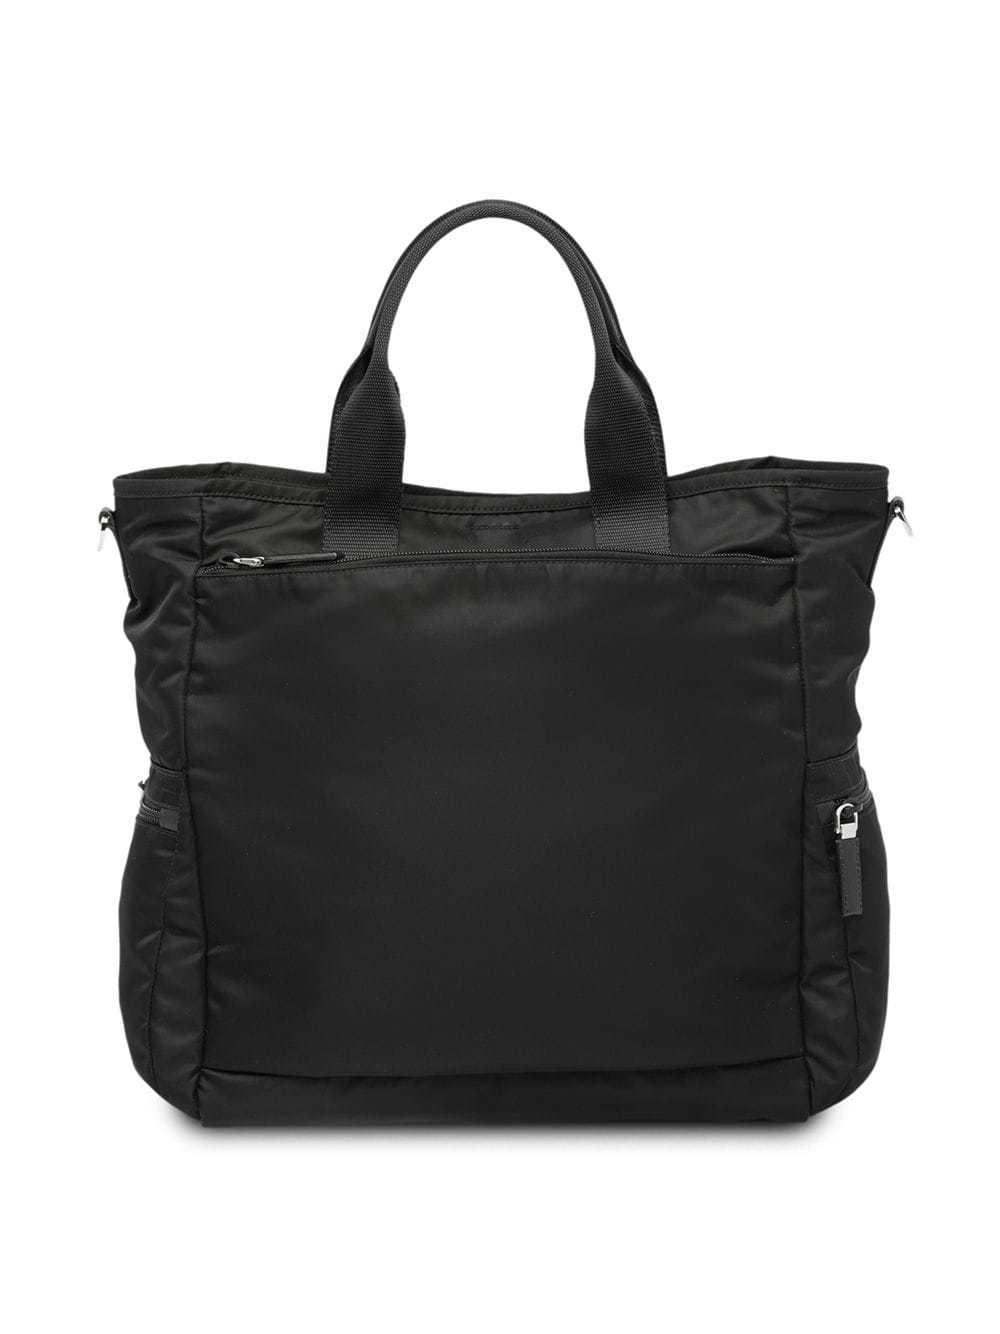 45ea5a1e223abb Prada Logo Plaque Tote Bag, $1,394 | farfetch.com | Lookastic.com